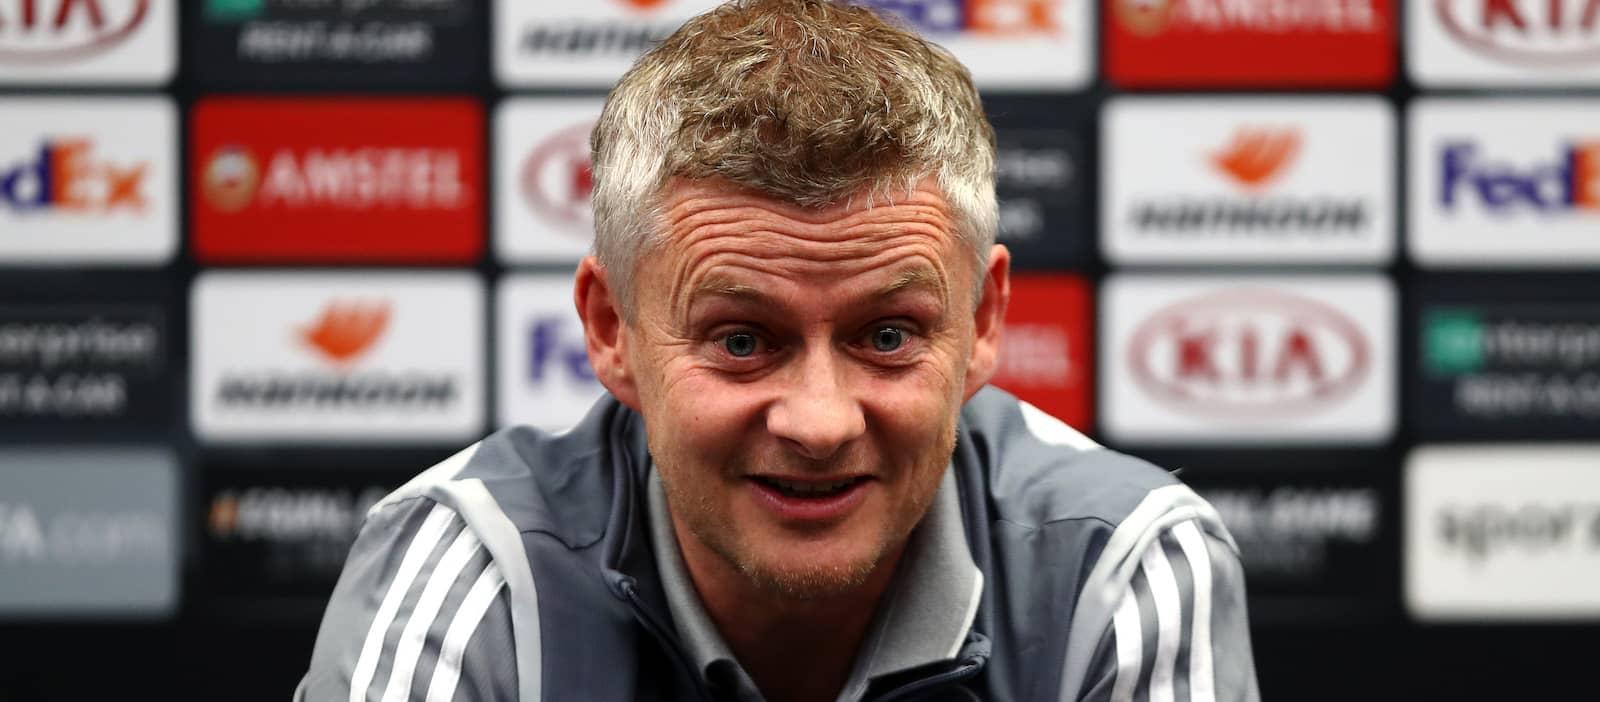 Man United fans turn on Ole Gunnar Solskjaer following transfer comments